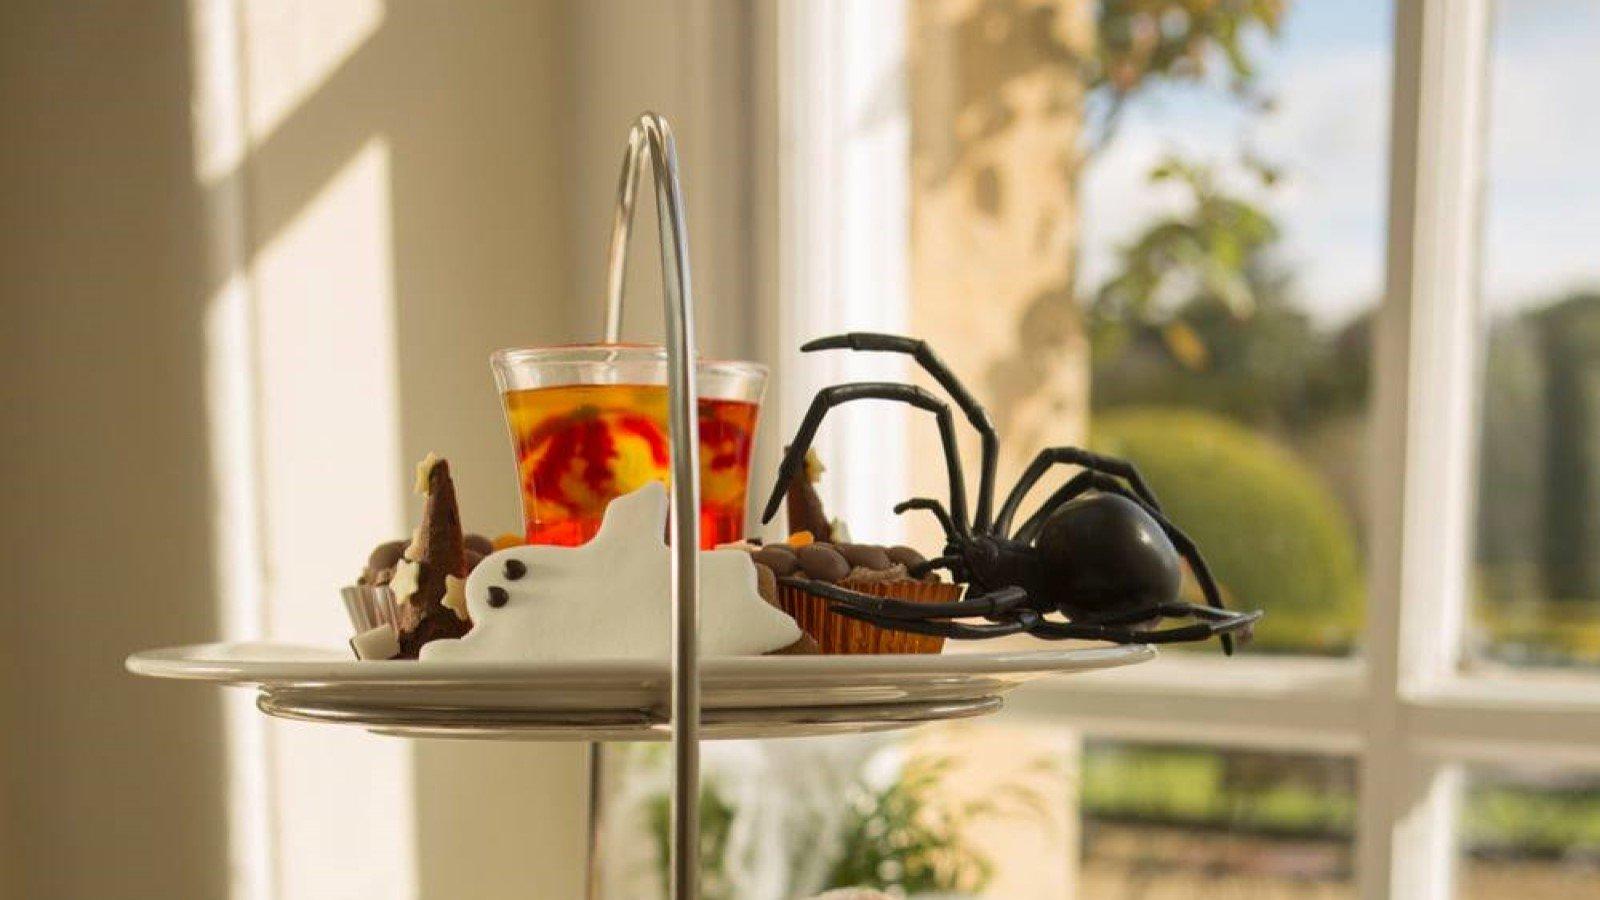 Halloween Children's Afternoon Tea at Blenheim Palace